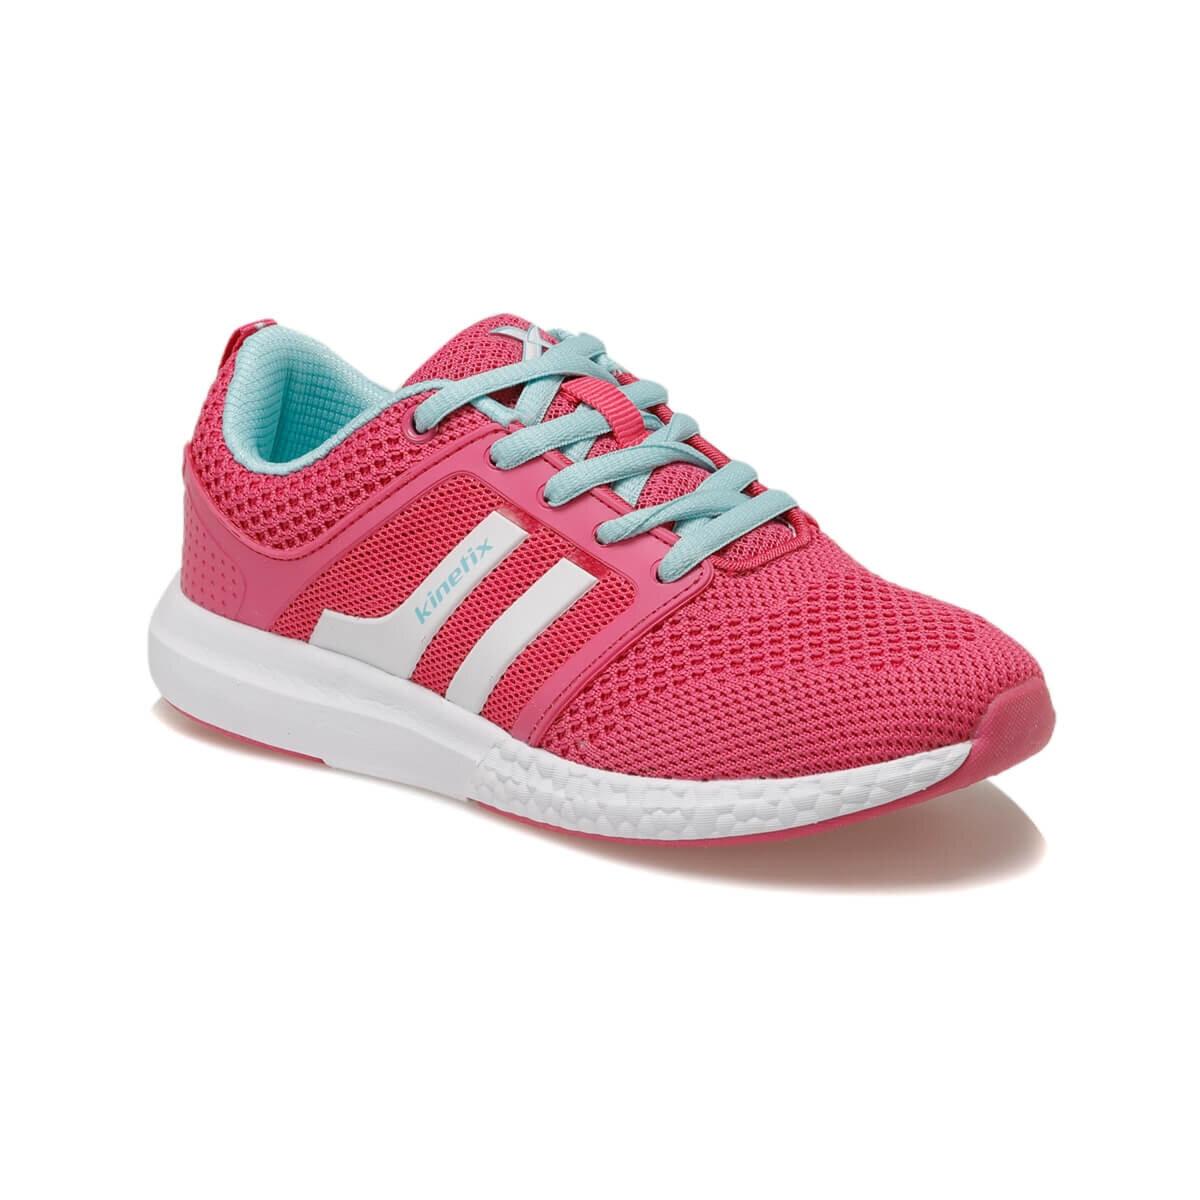 FLO KEYA Fuchsia Female Child Sneaker Shoes KINETIX